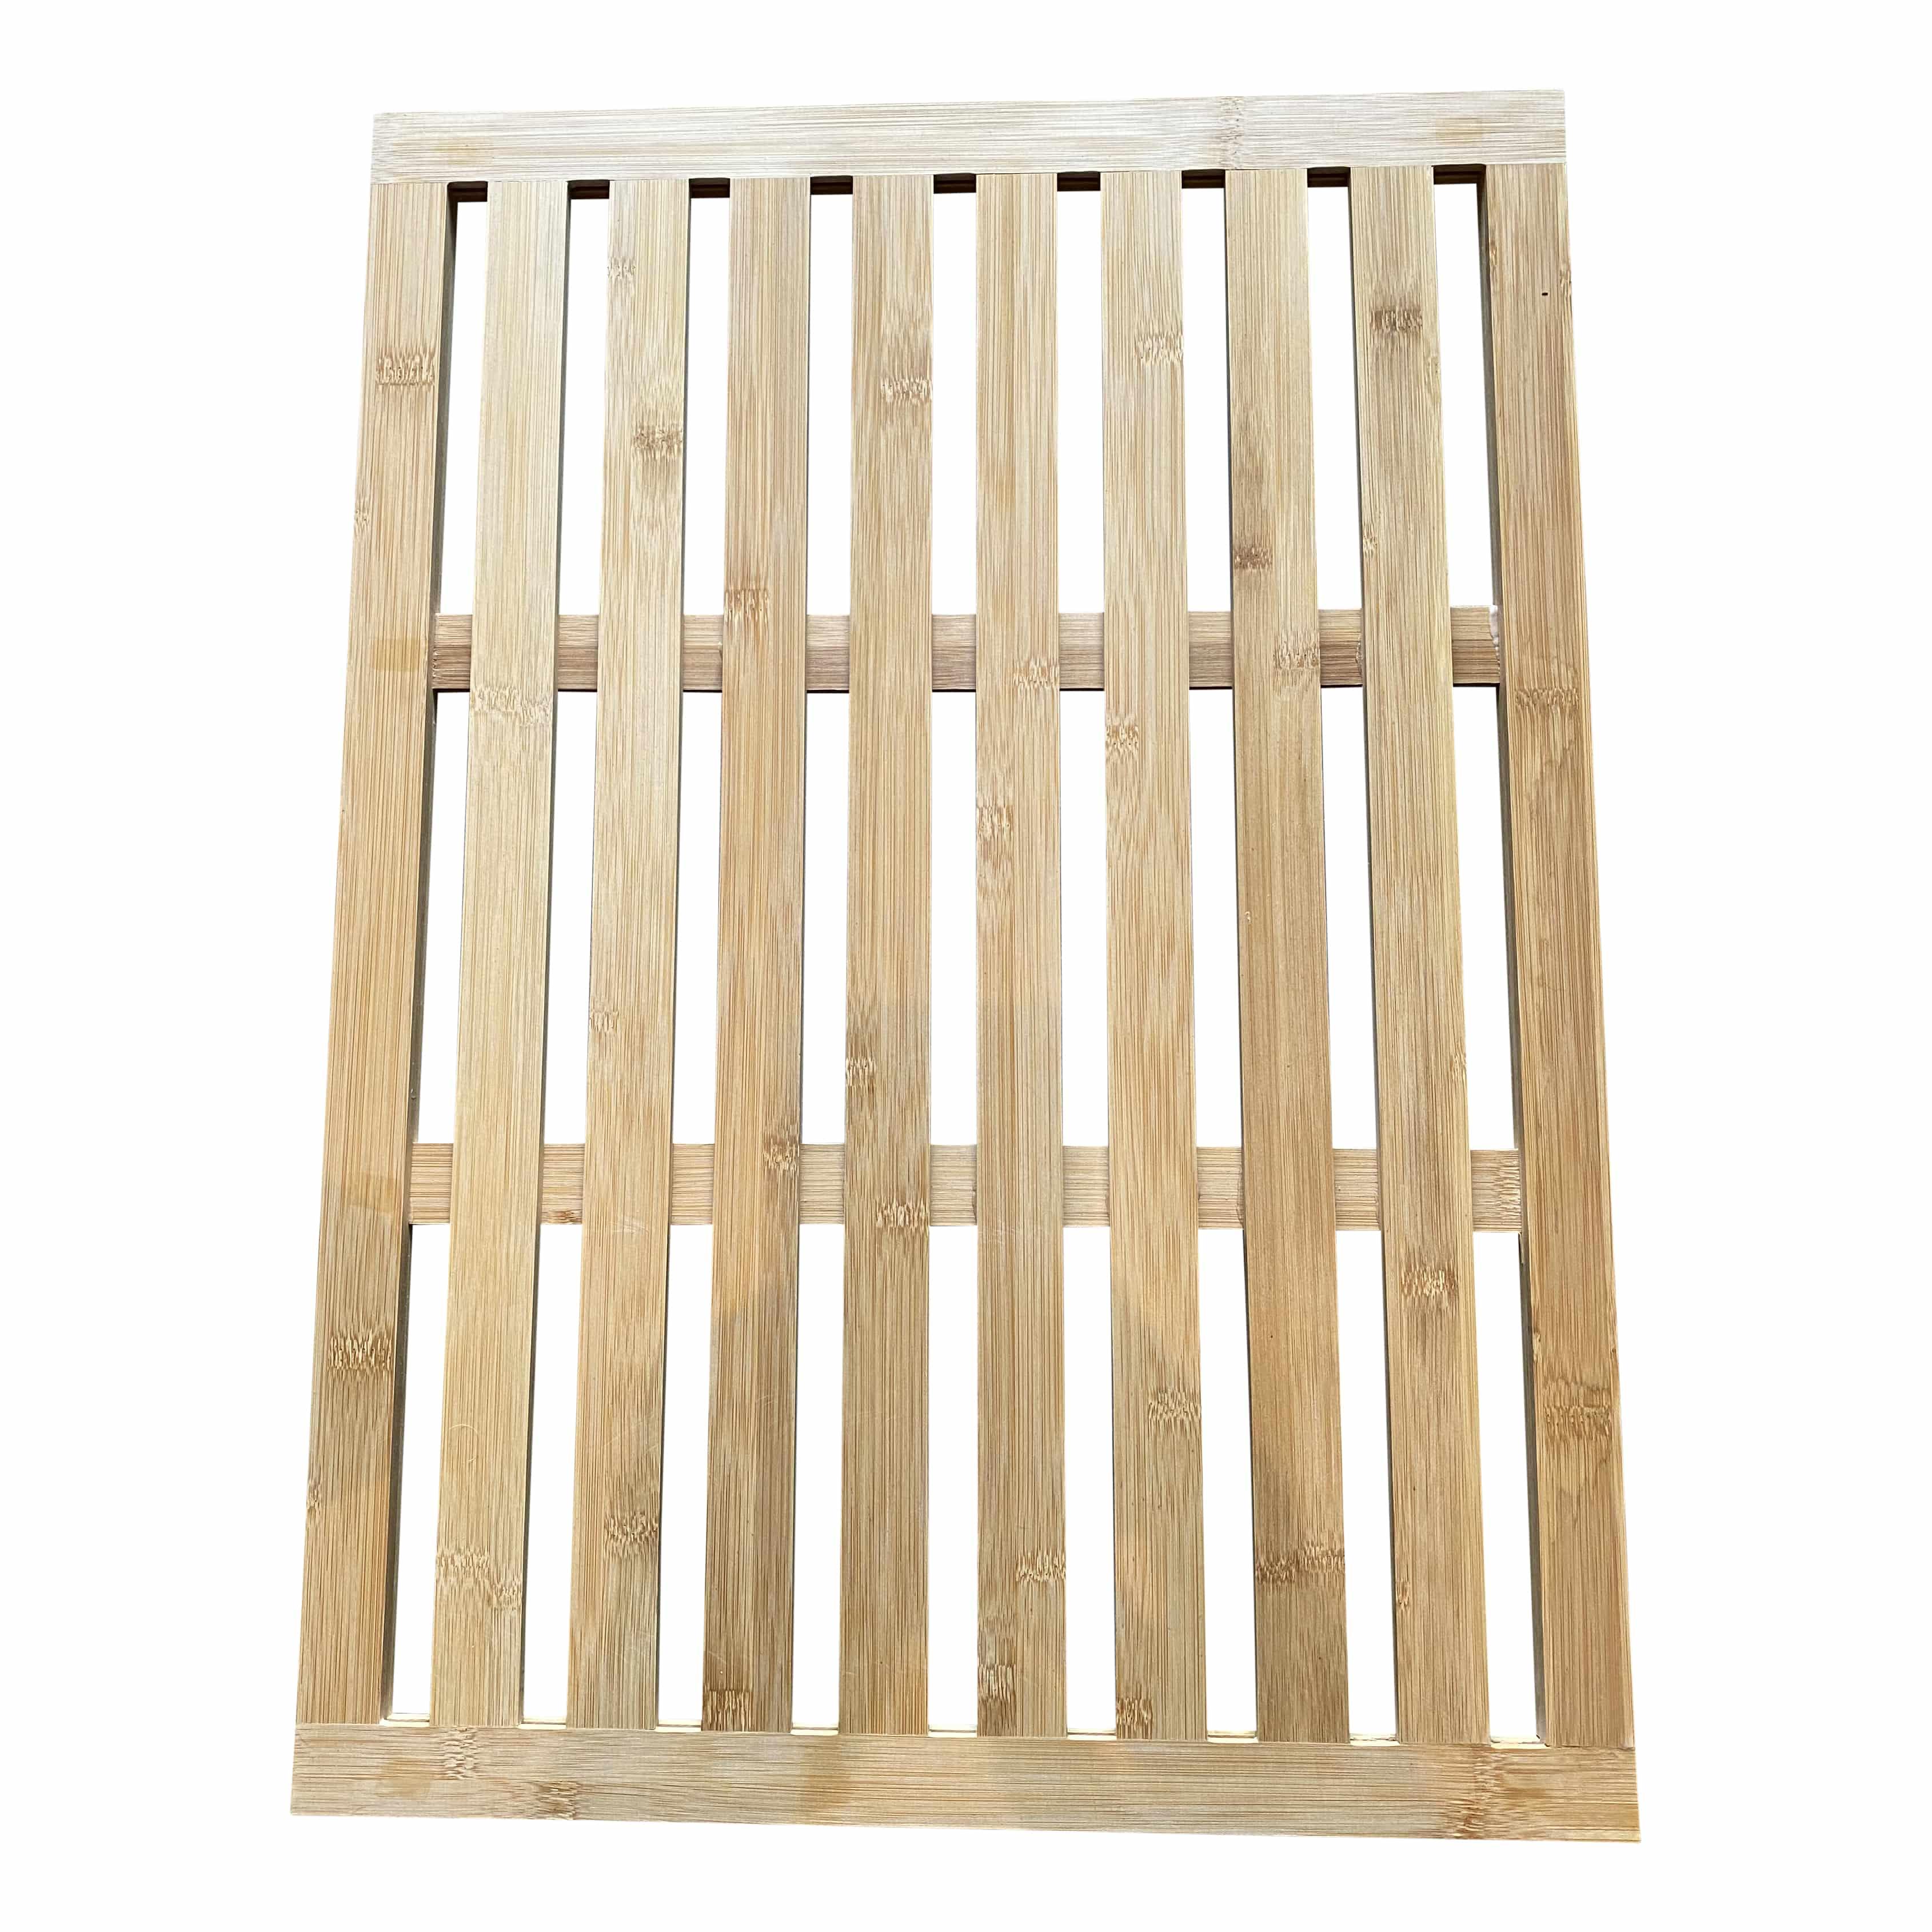 4goodz bamboe anti-slip douchemat-badmat 62x45cm - houten voetenmat